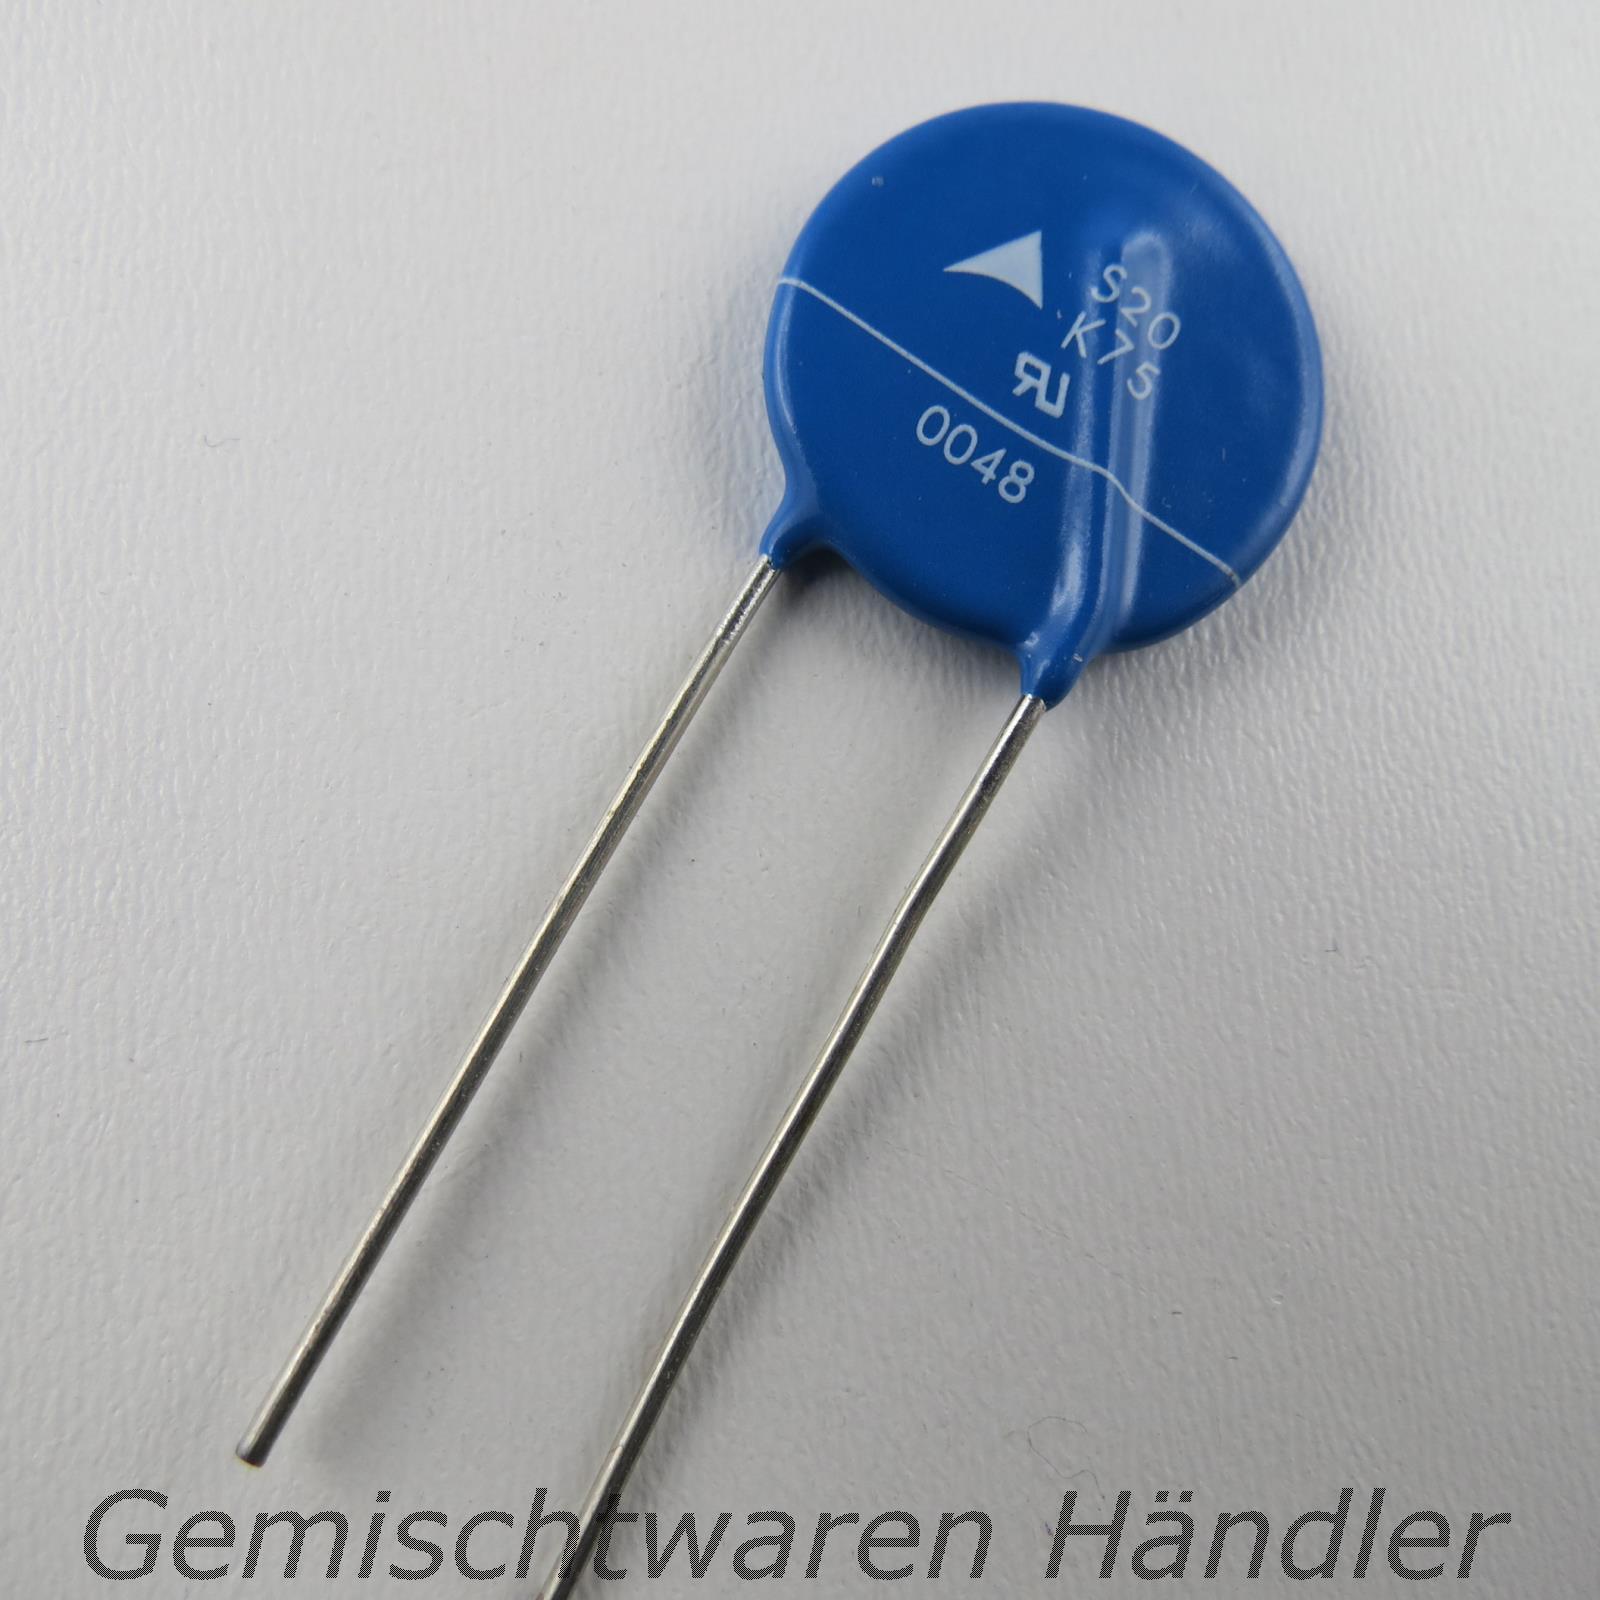 5x Varistor siov-S20K75 metal oxide; THT; 75VAC; 100VDC; 120V RoHS 6; 5kA 40J EPCOS